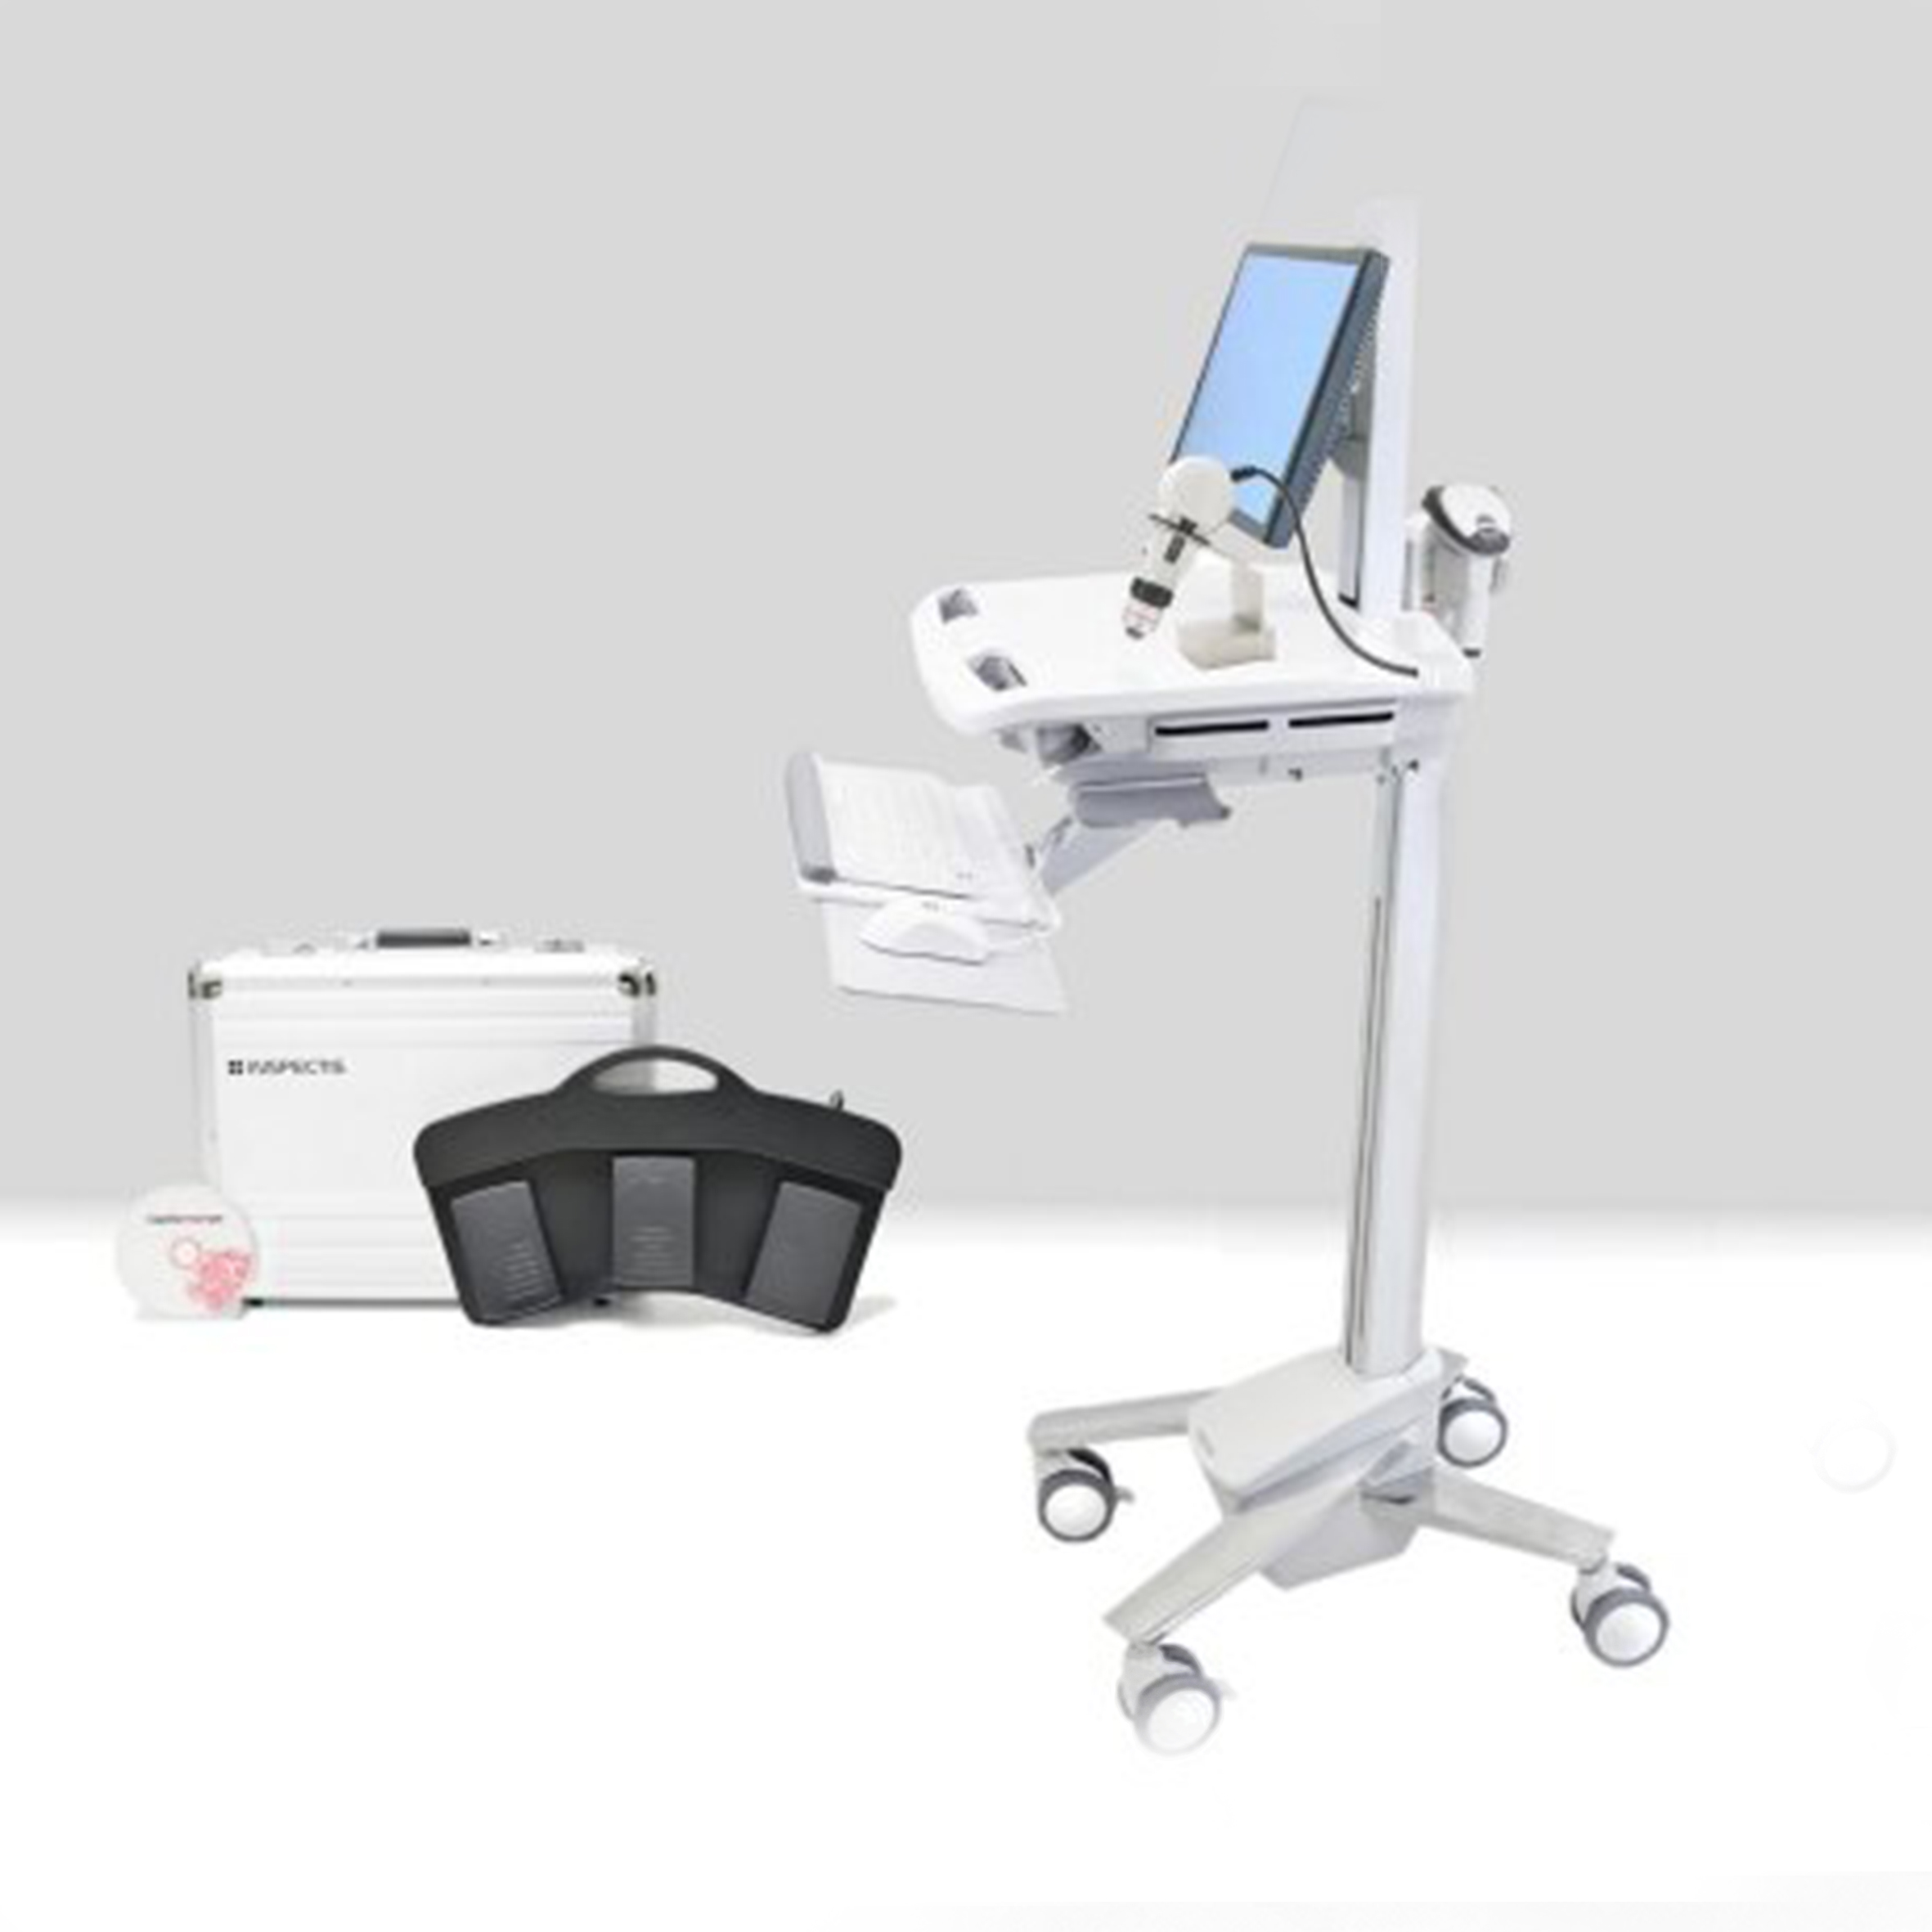 Video capilaroscopia del pliegue ungueal, extensa